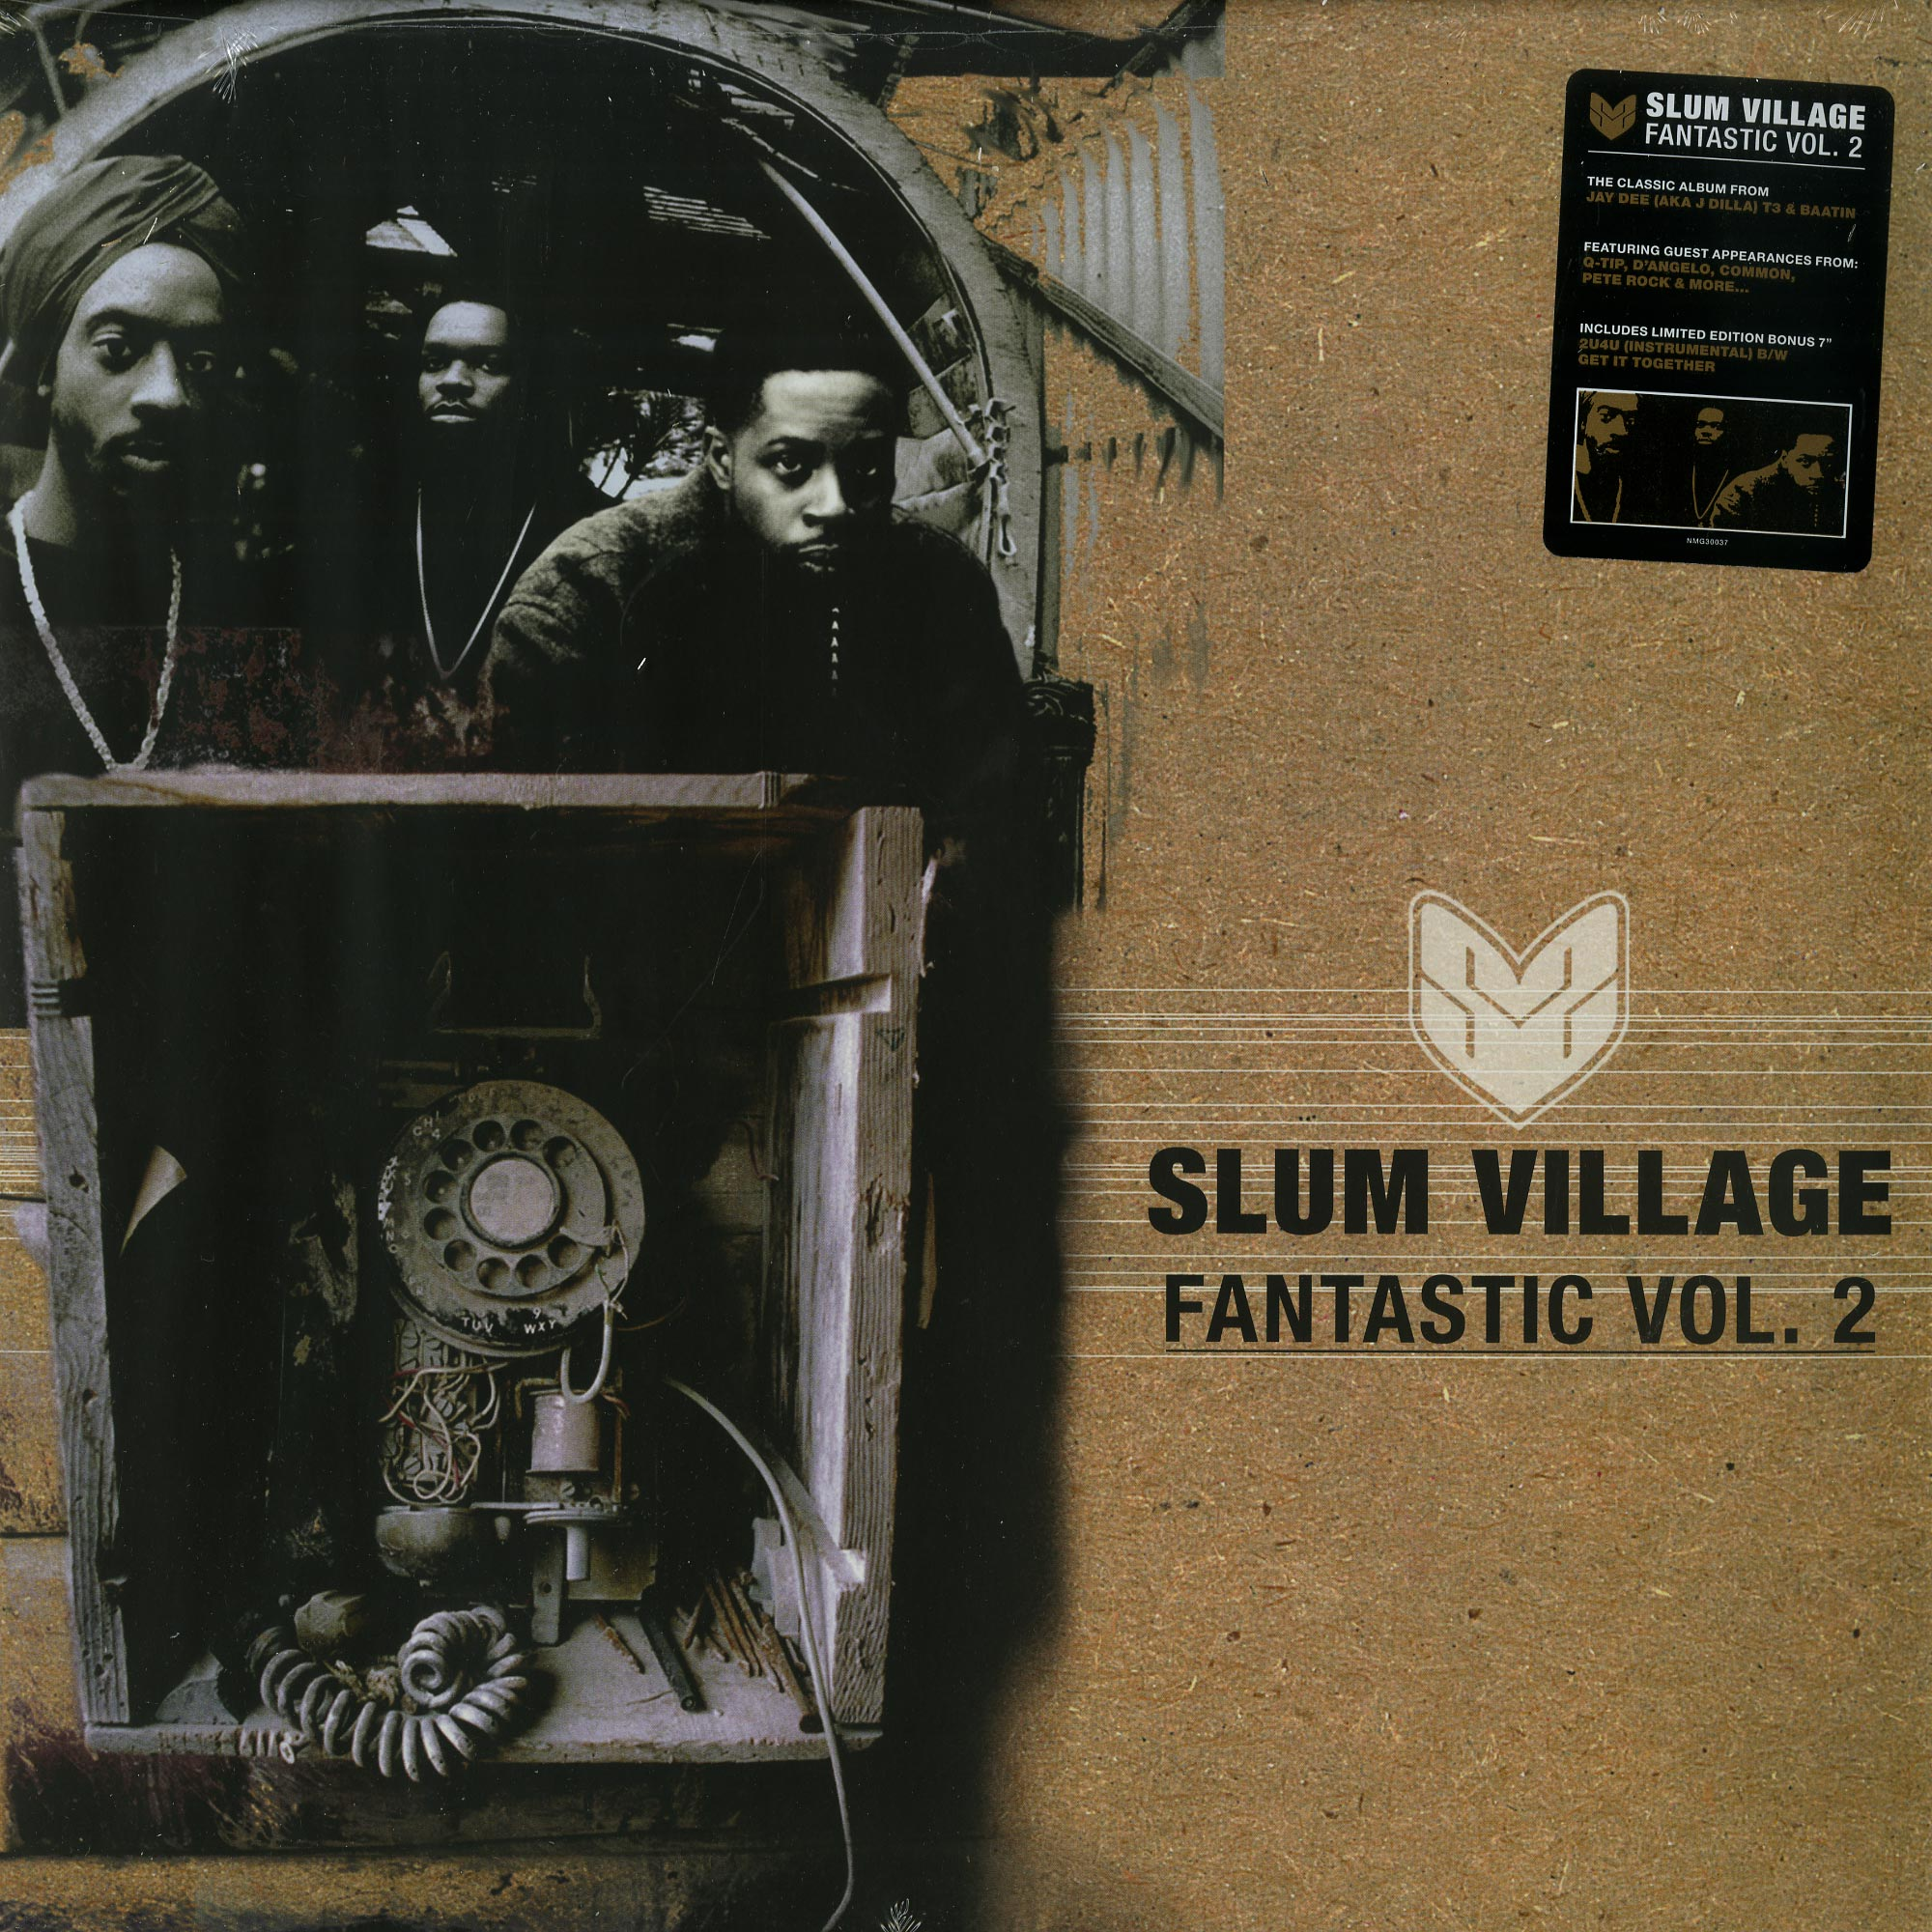 Slum Village - FANTASTIC VOL.2